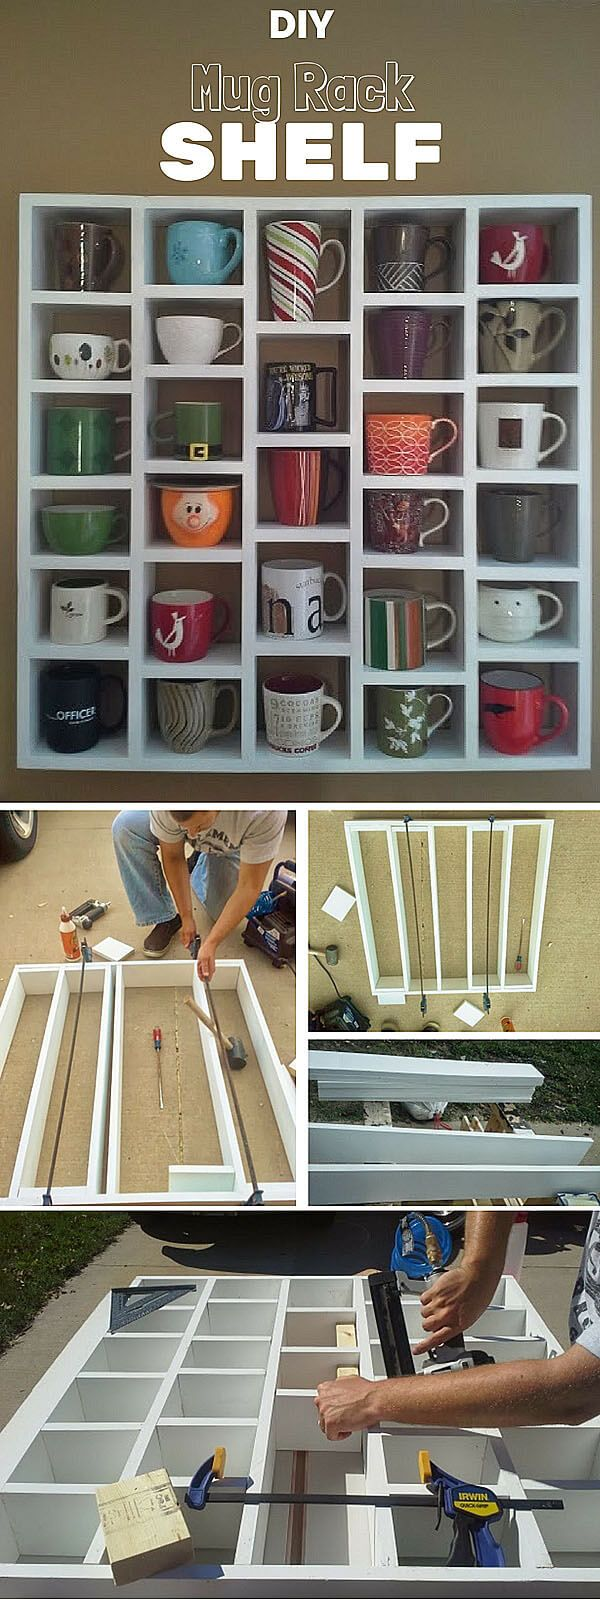 Fun And Creative Coffee Mug Organization Ideas Cubby Shelves - Best coffee mug organization ideas